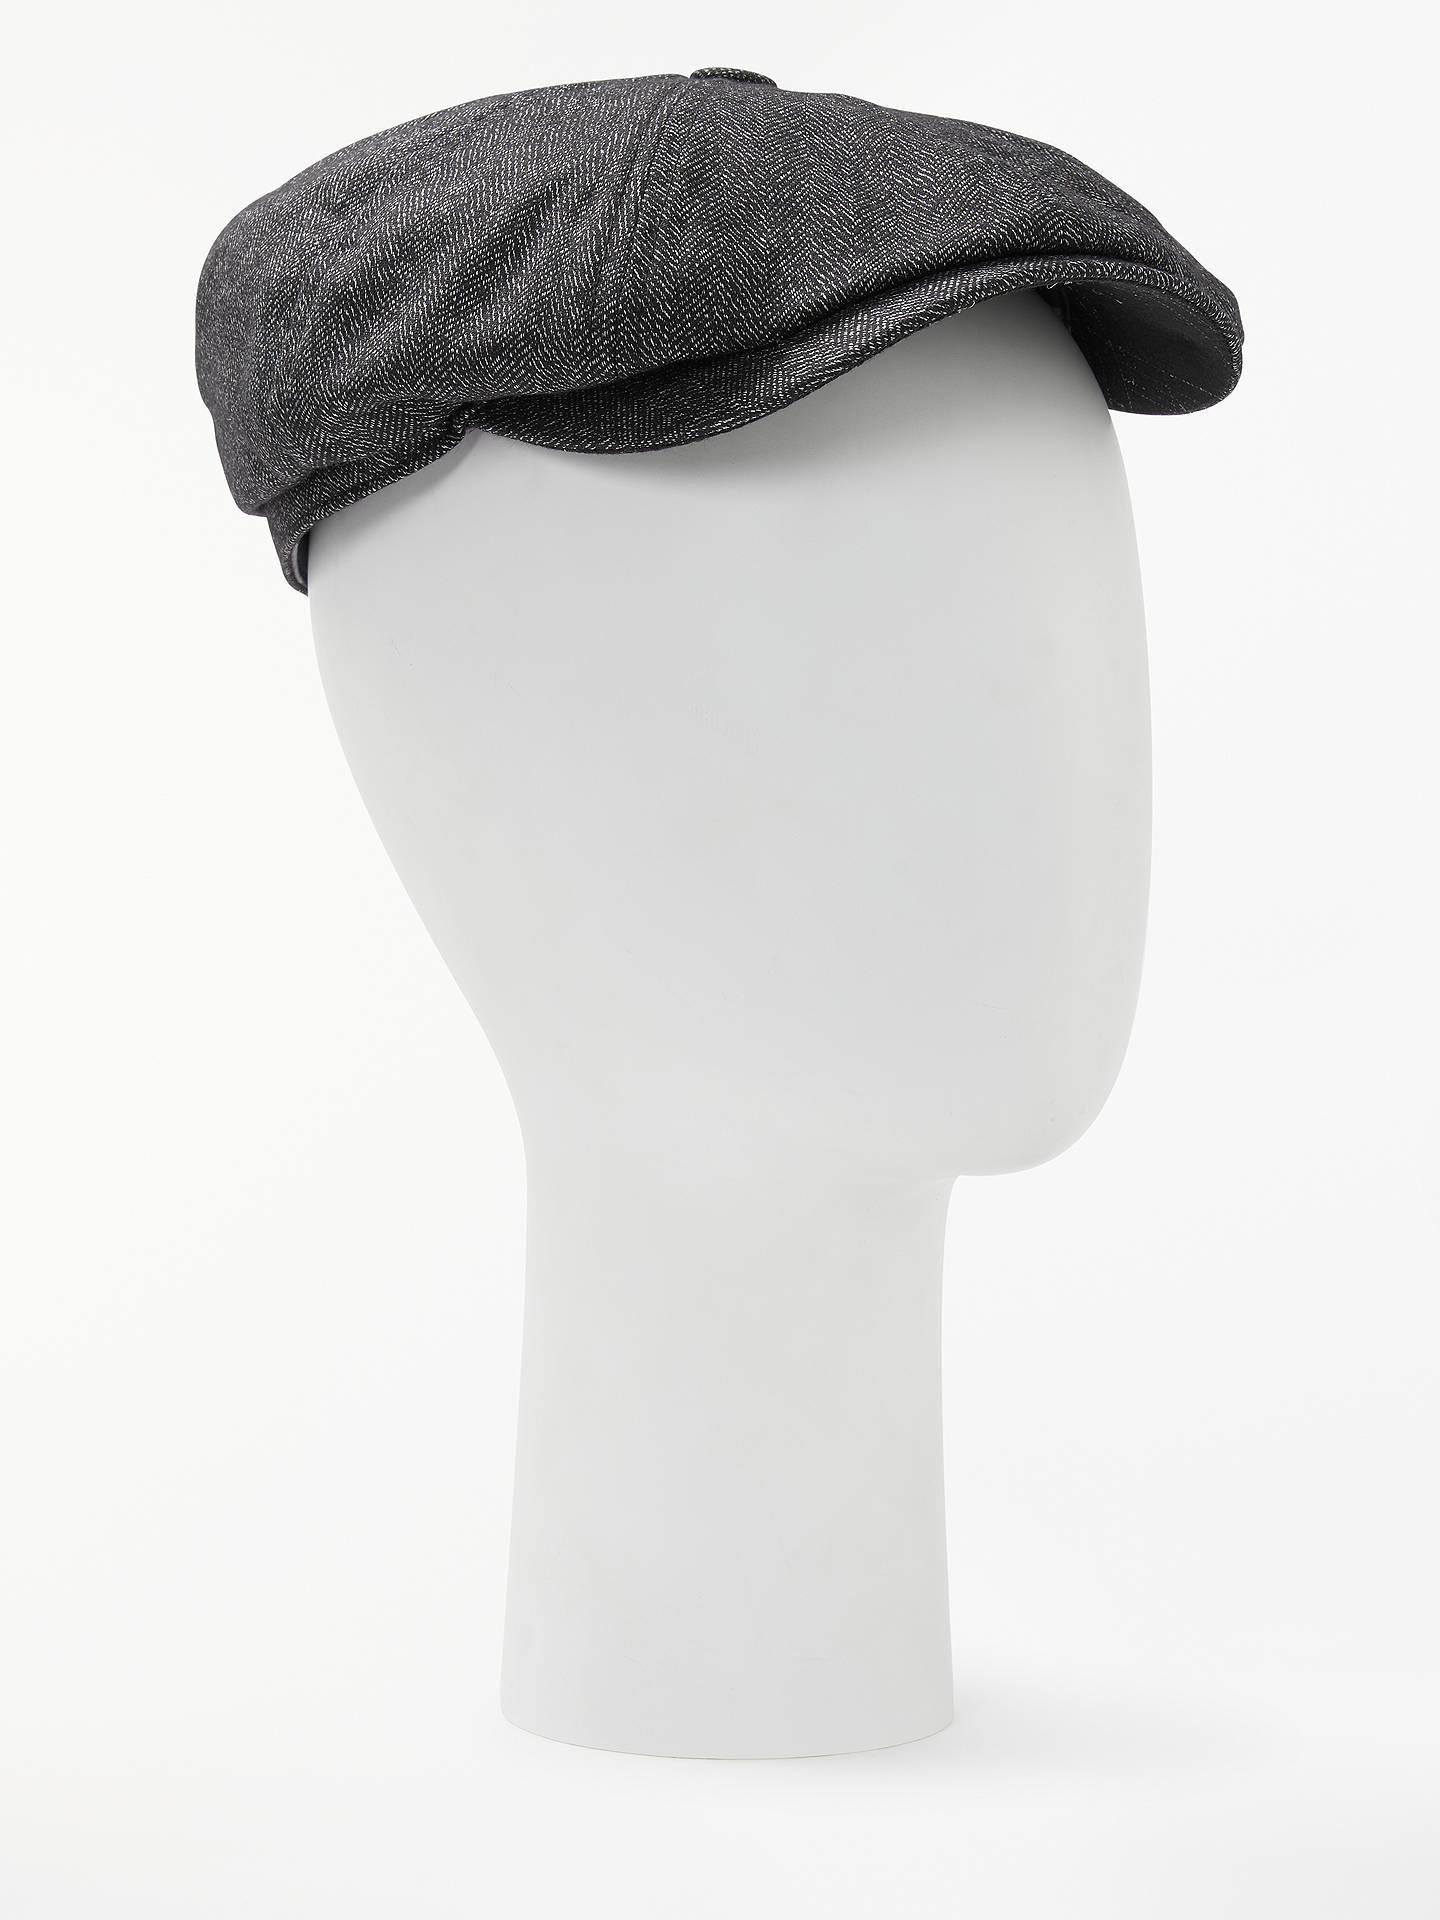 BuyTed Baker Herringbone Baker Boy Hat 8262fc5a99c